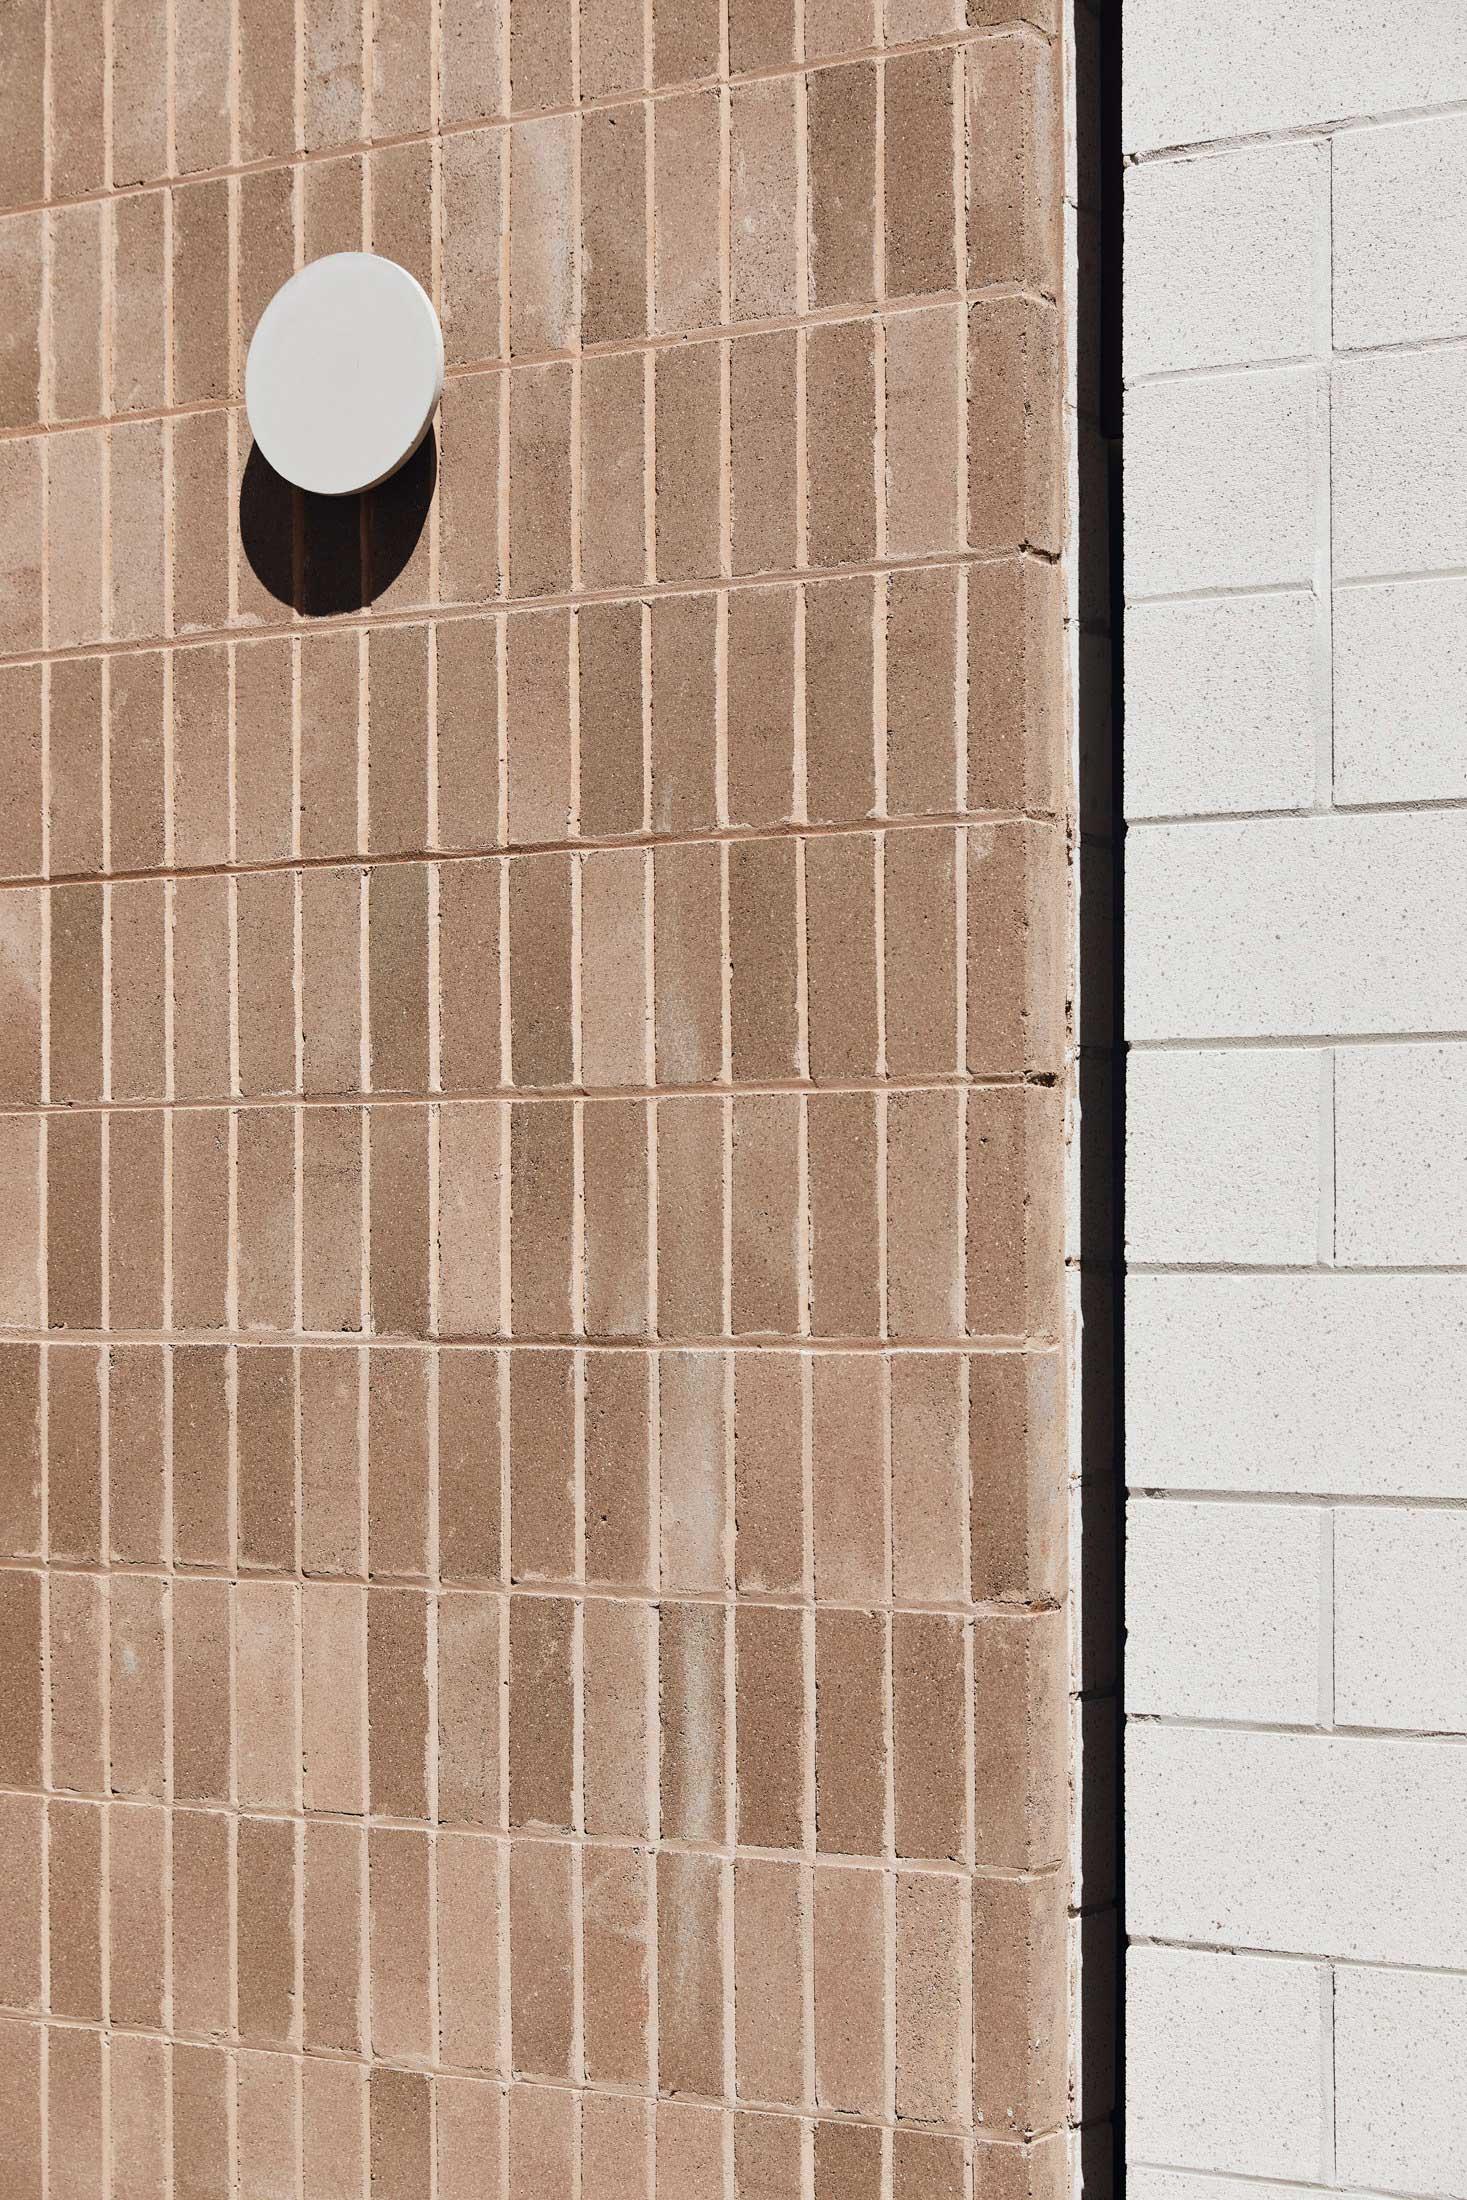 Architects Eat Bellows Beach House Flinders Masonry Architecture Photo Derek Swalwell Yellowtrace 52